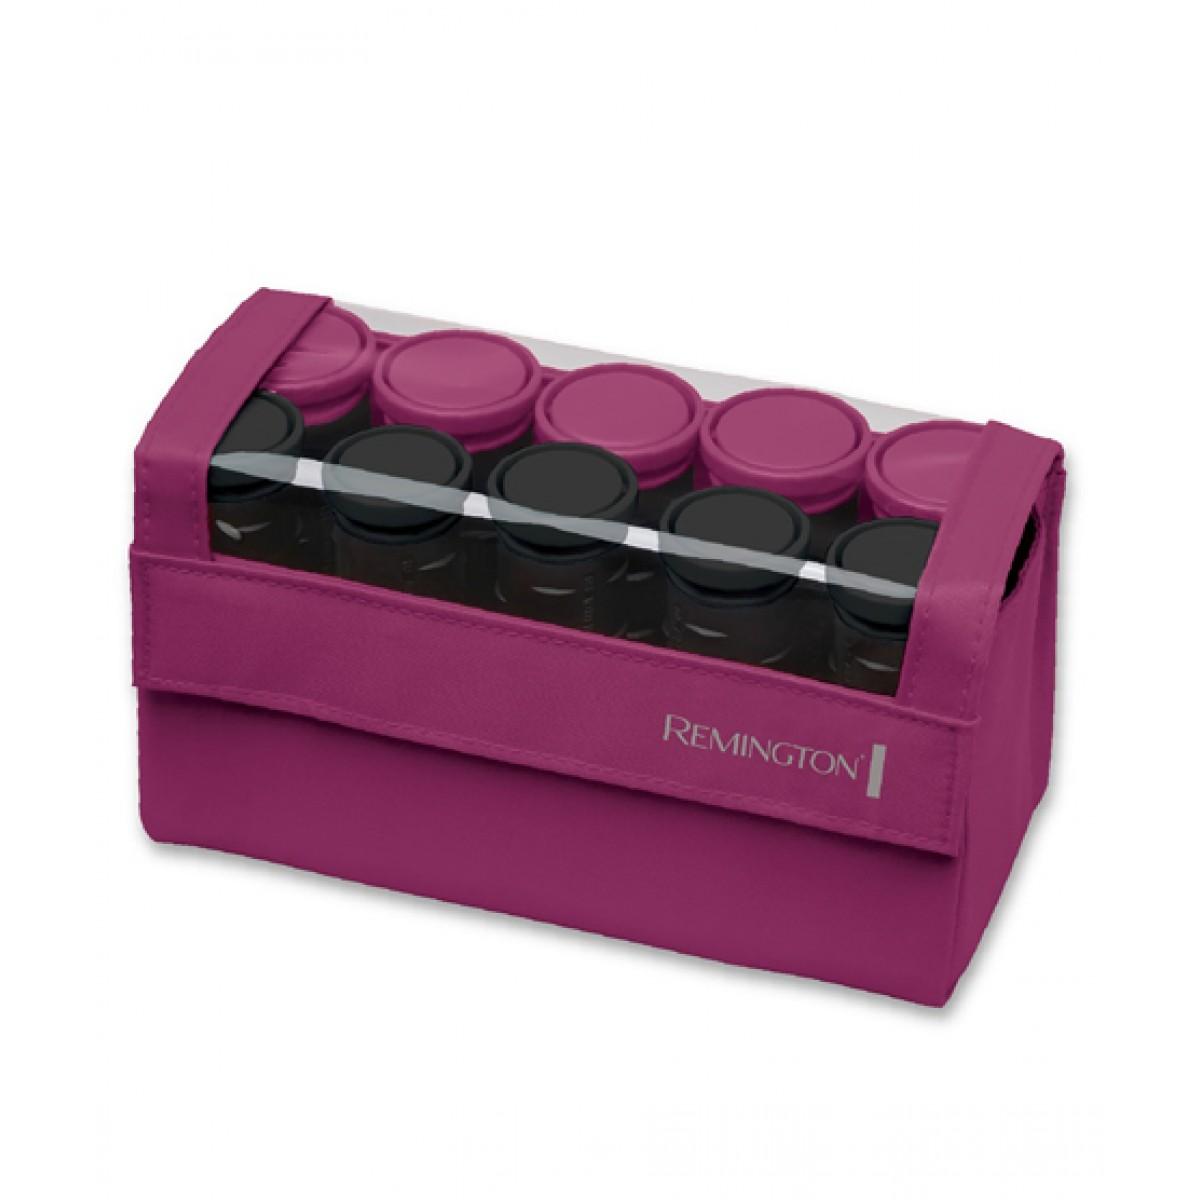 Remington Ceramic Compact Hair Setter (H1015G)